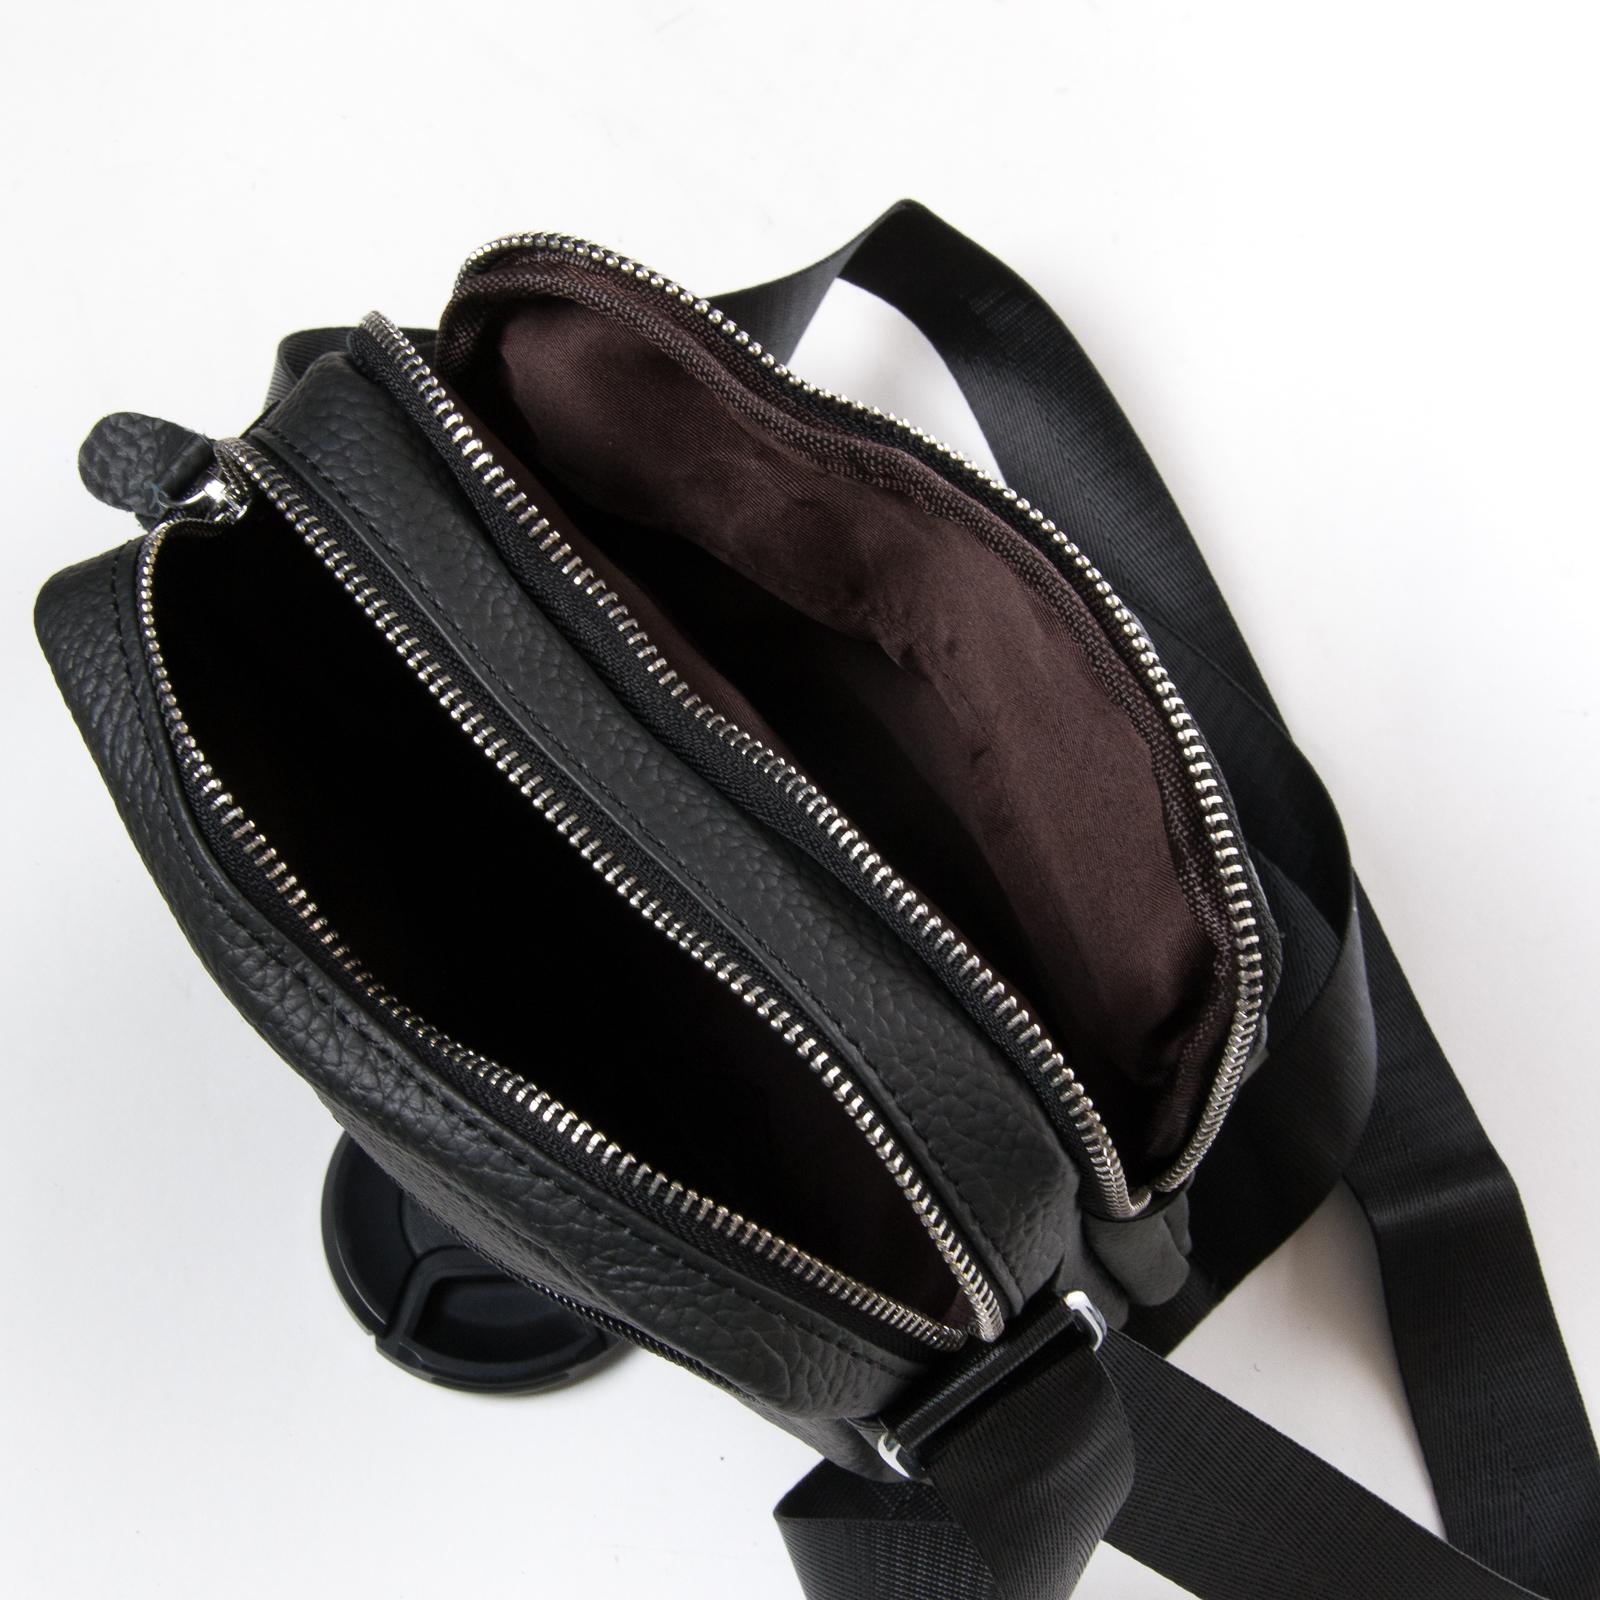 Сумка Мужская Планшет кожа DR. BOND 8016 black - фото 5